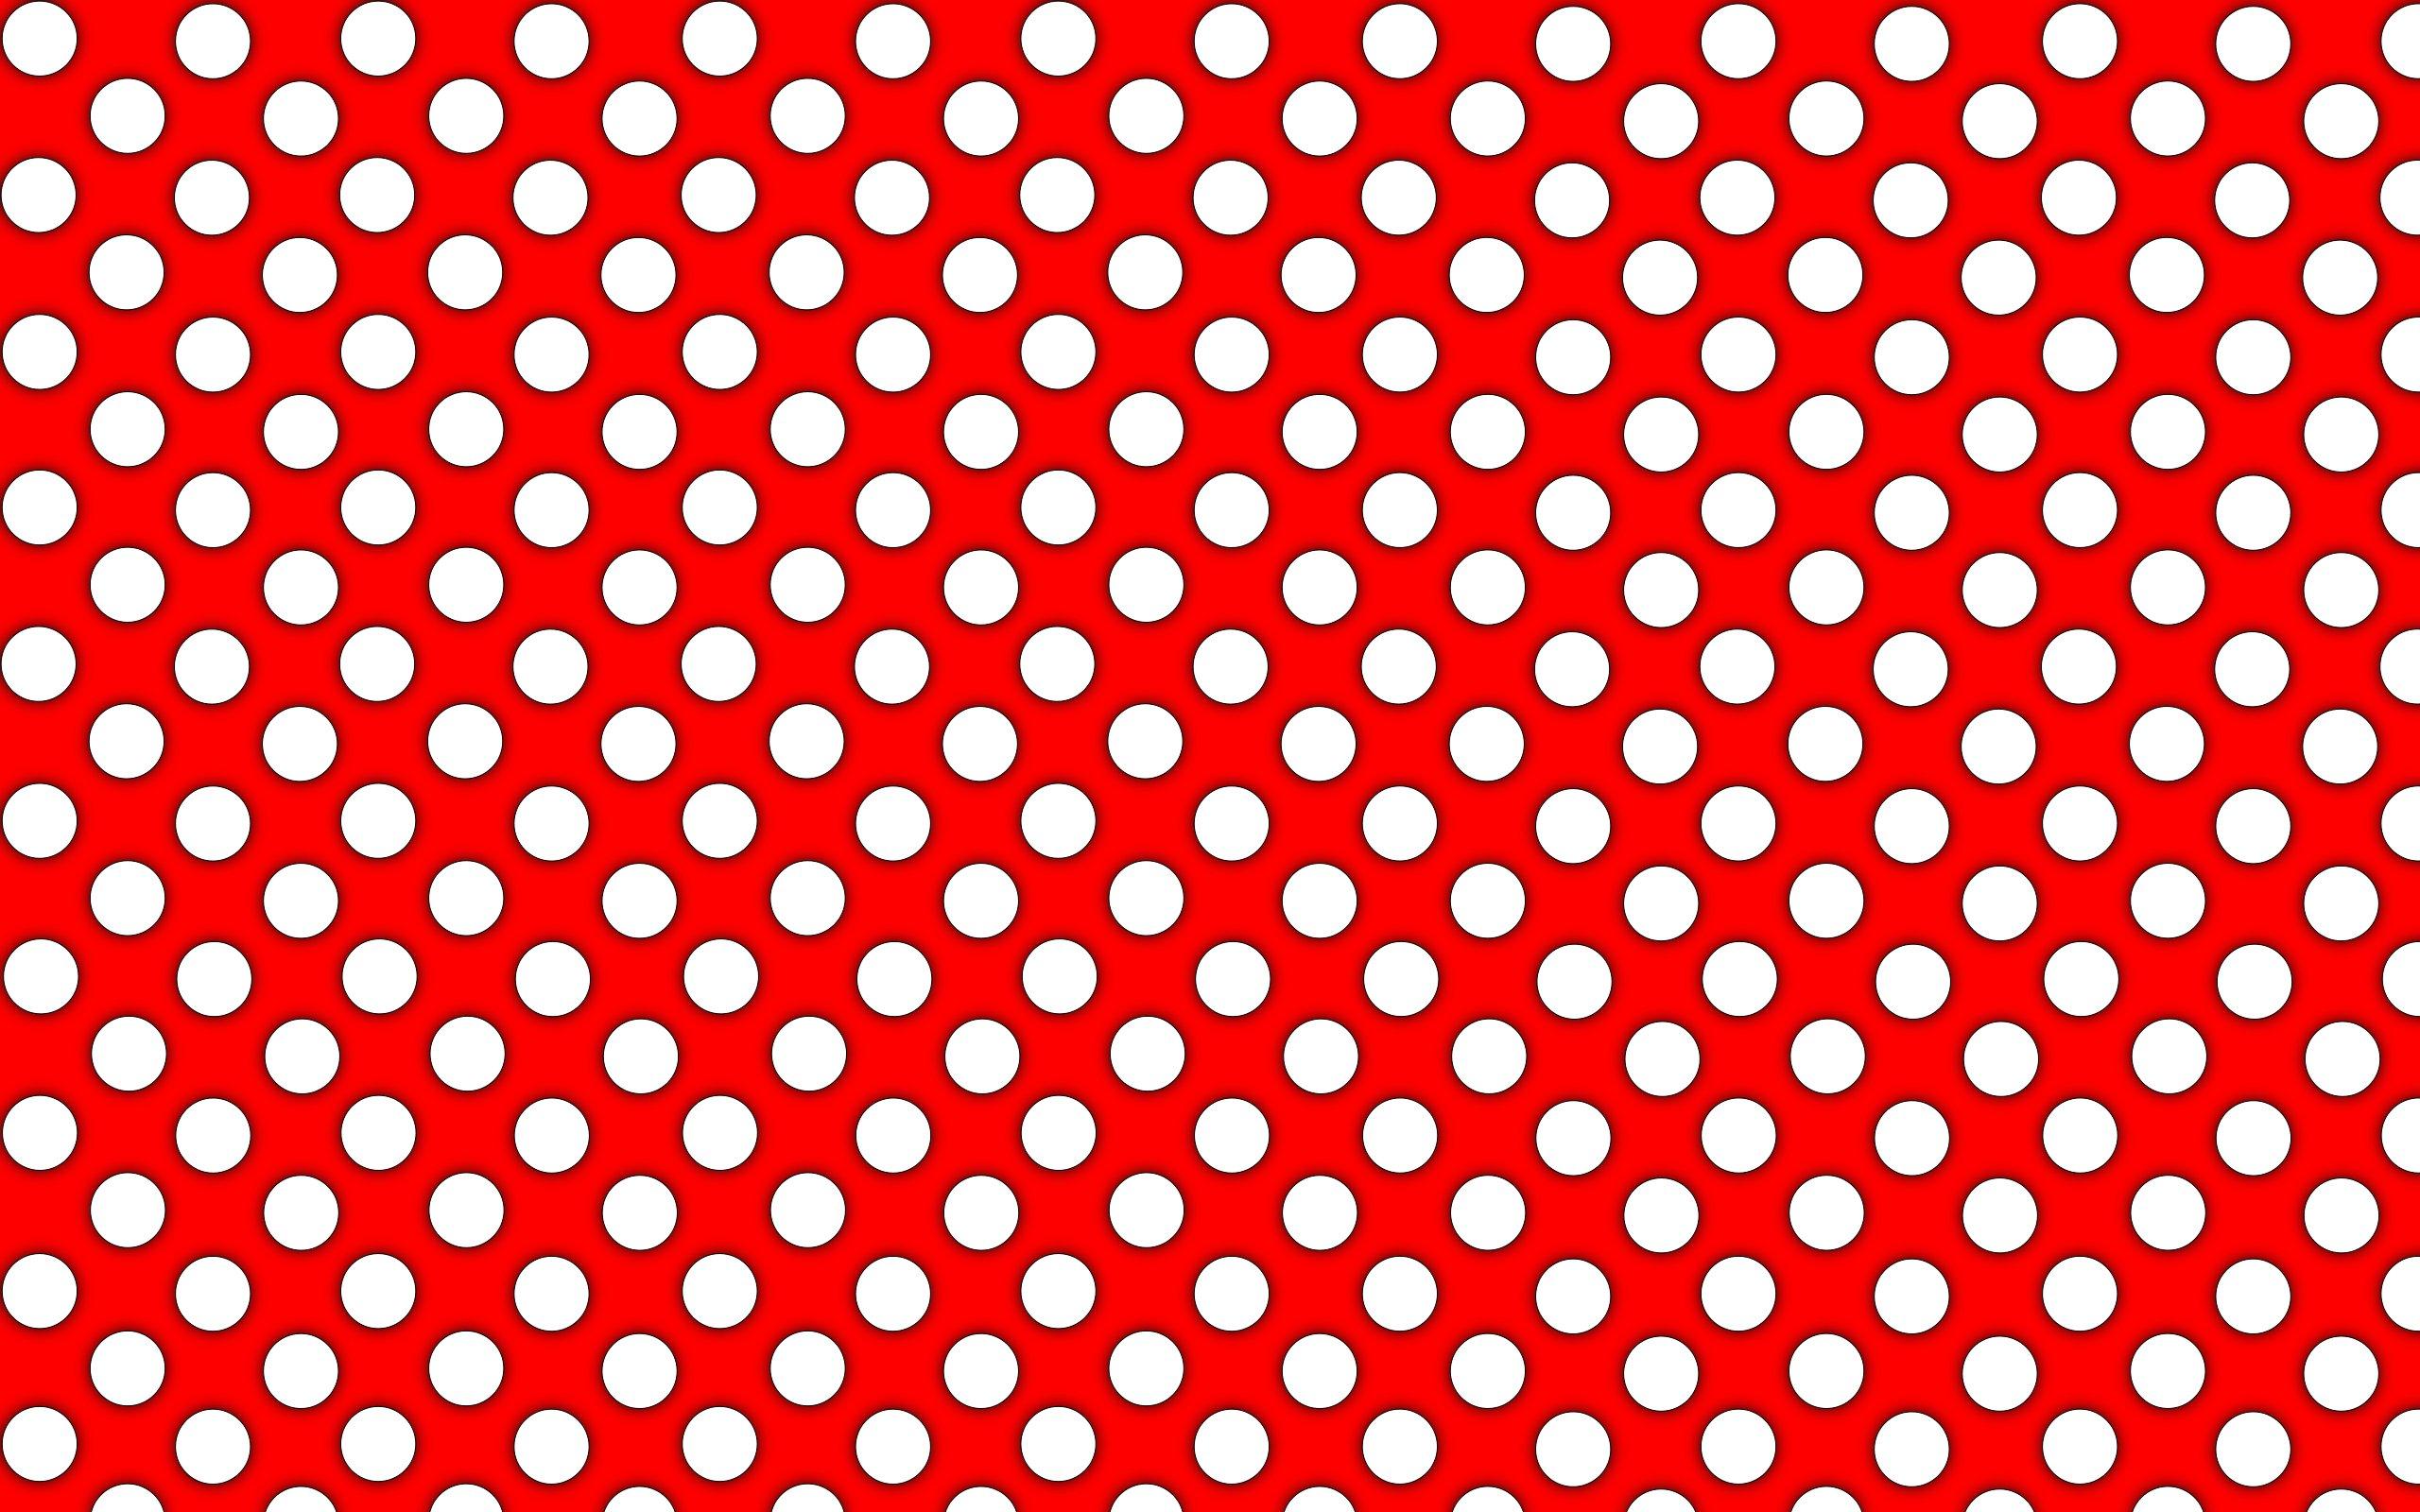 Hd wallpaper polka dot card stock wallpapers for gt red polka dots